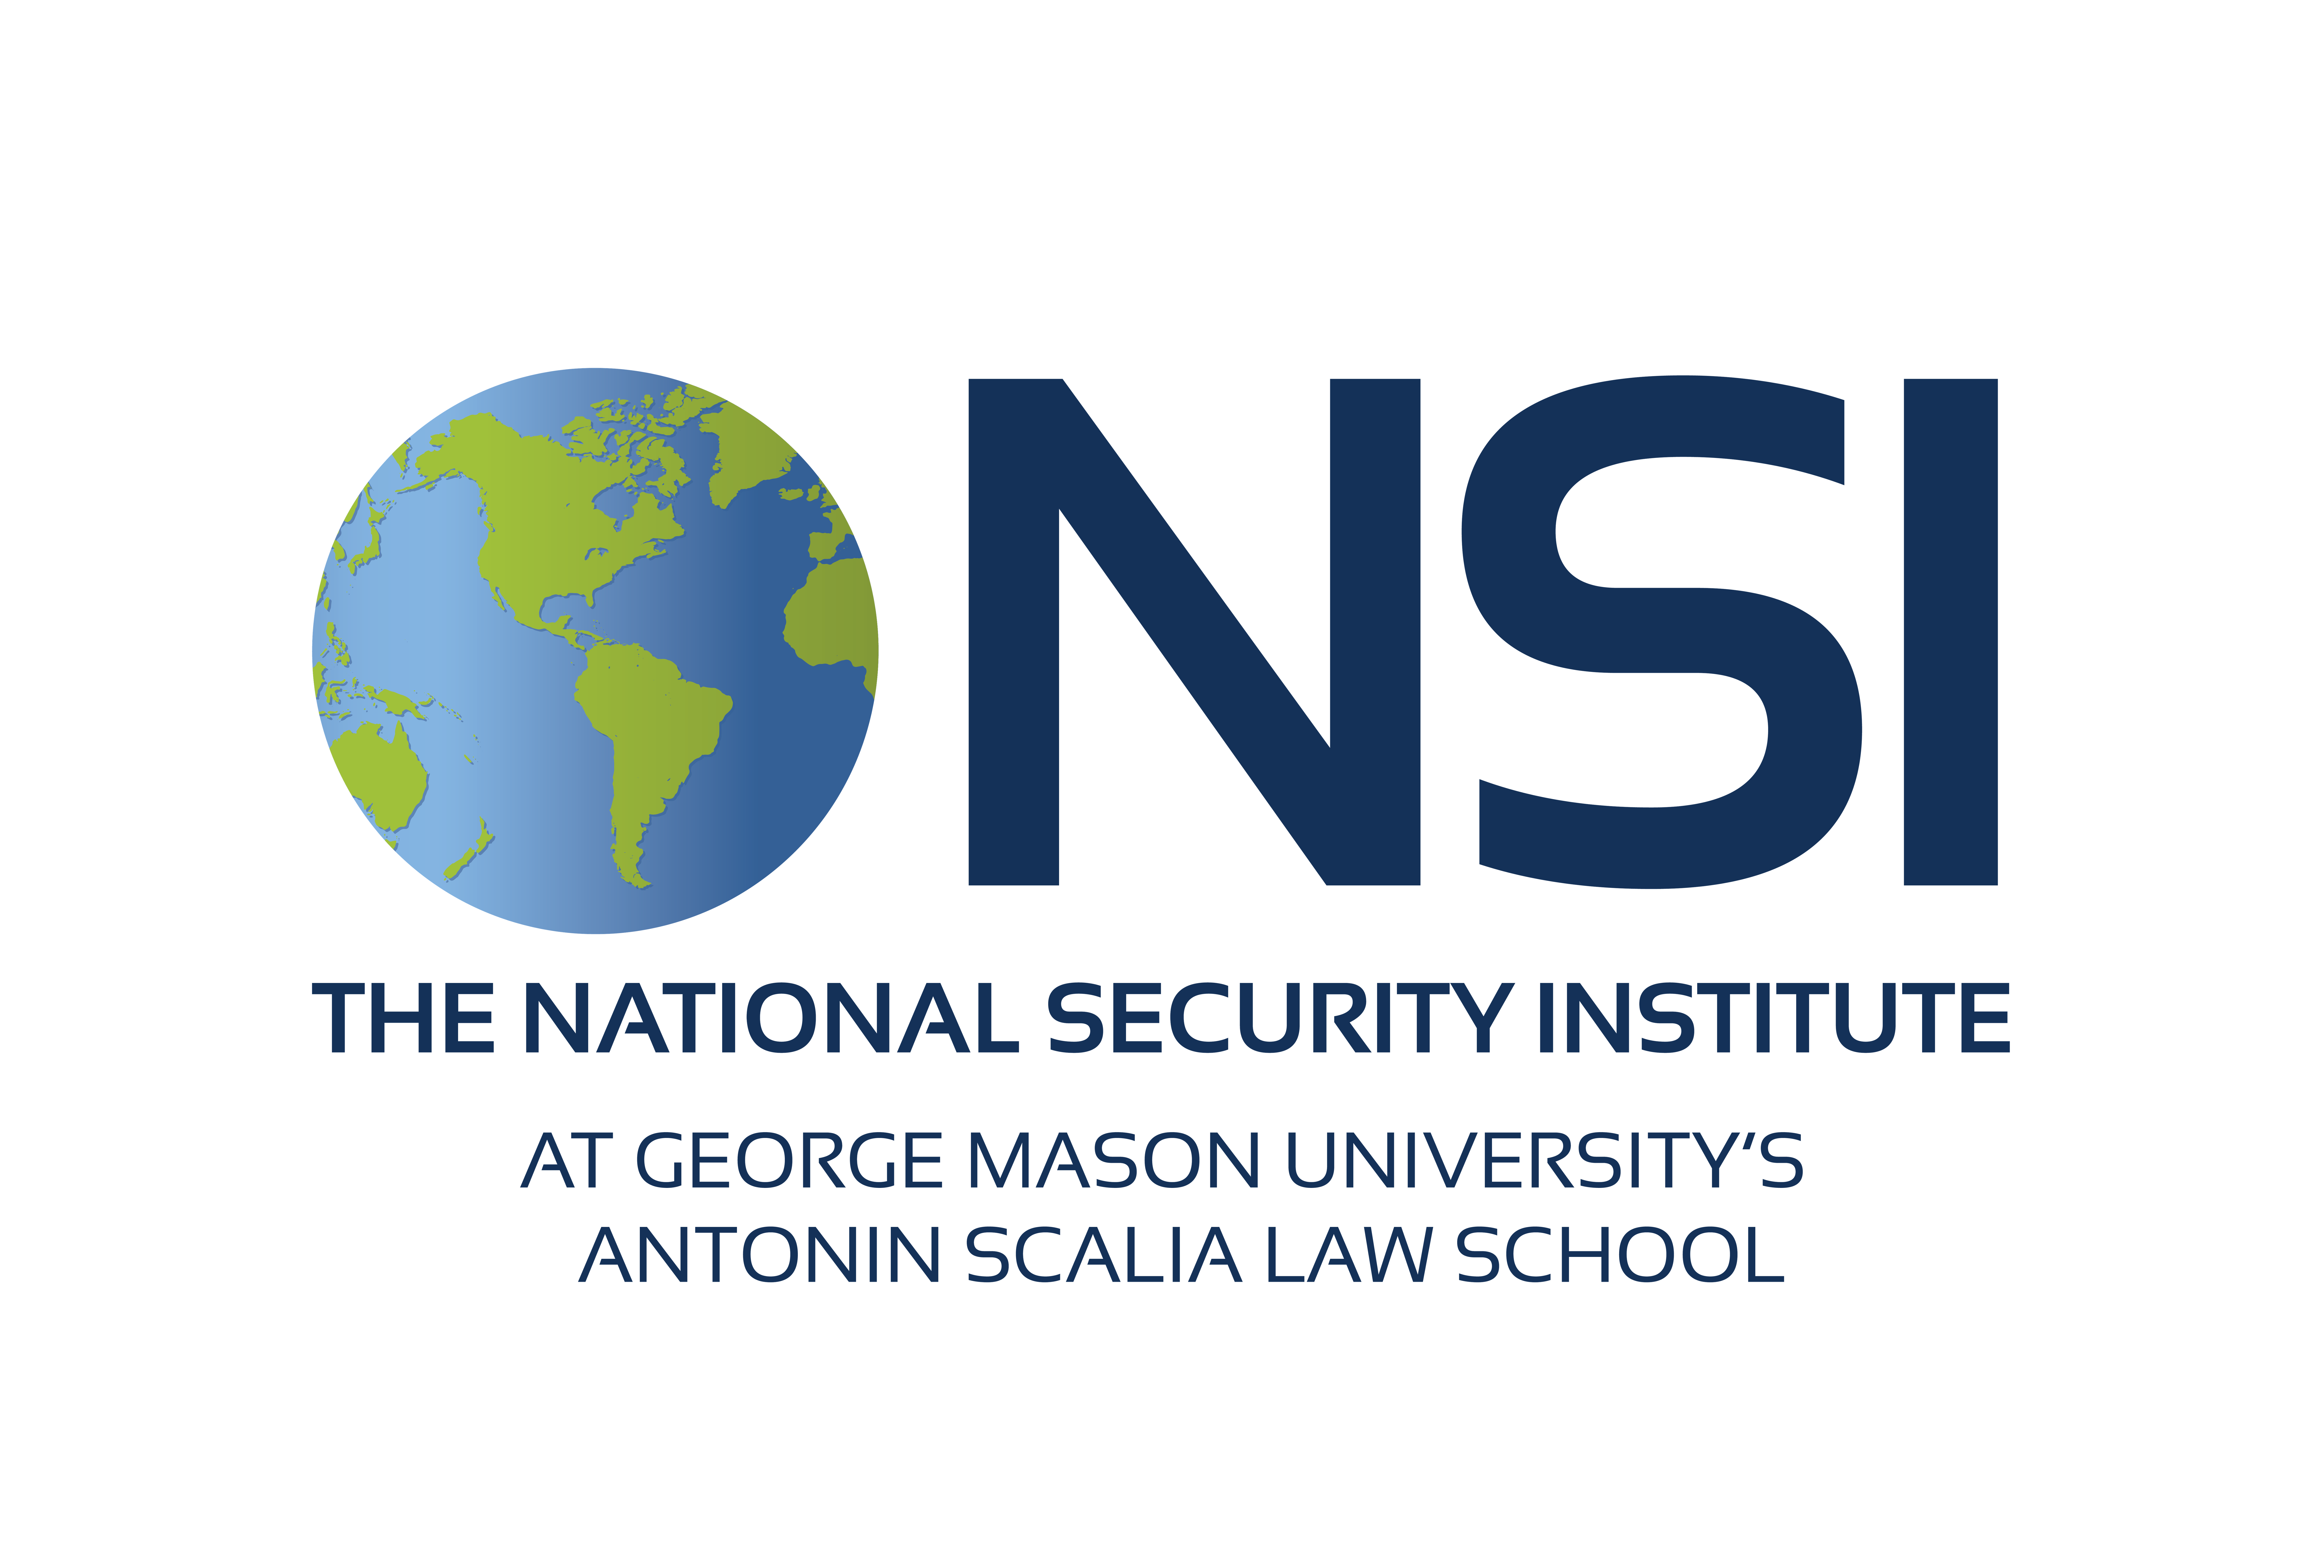 National Security Institute logo